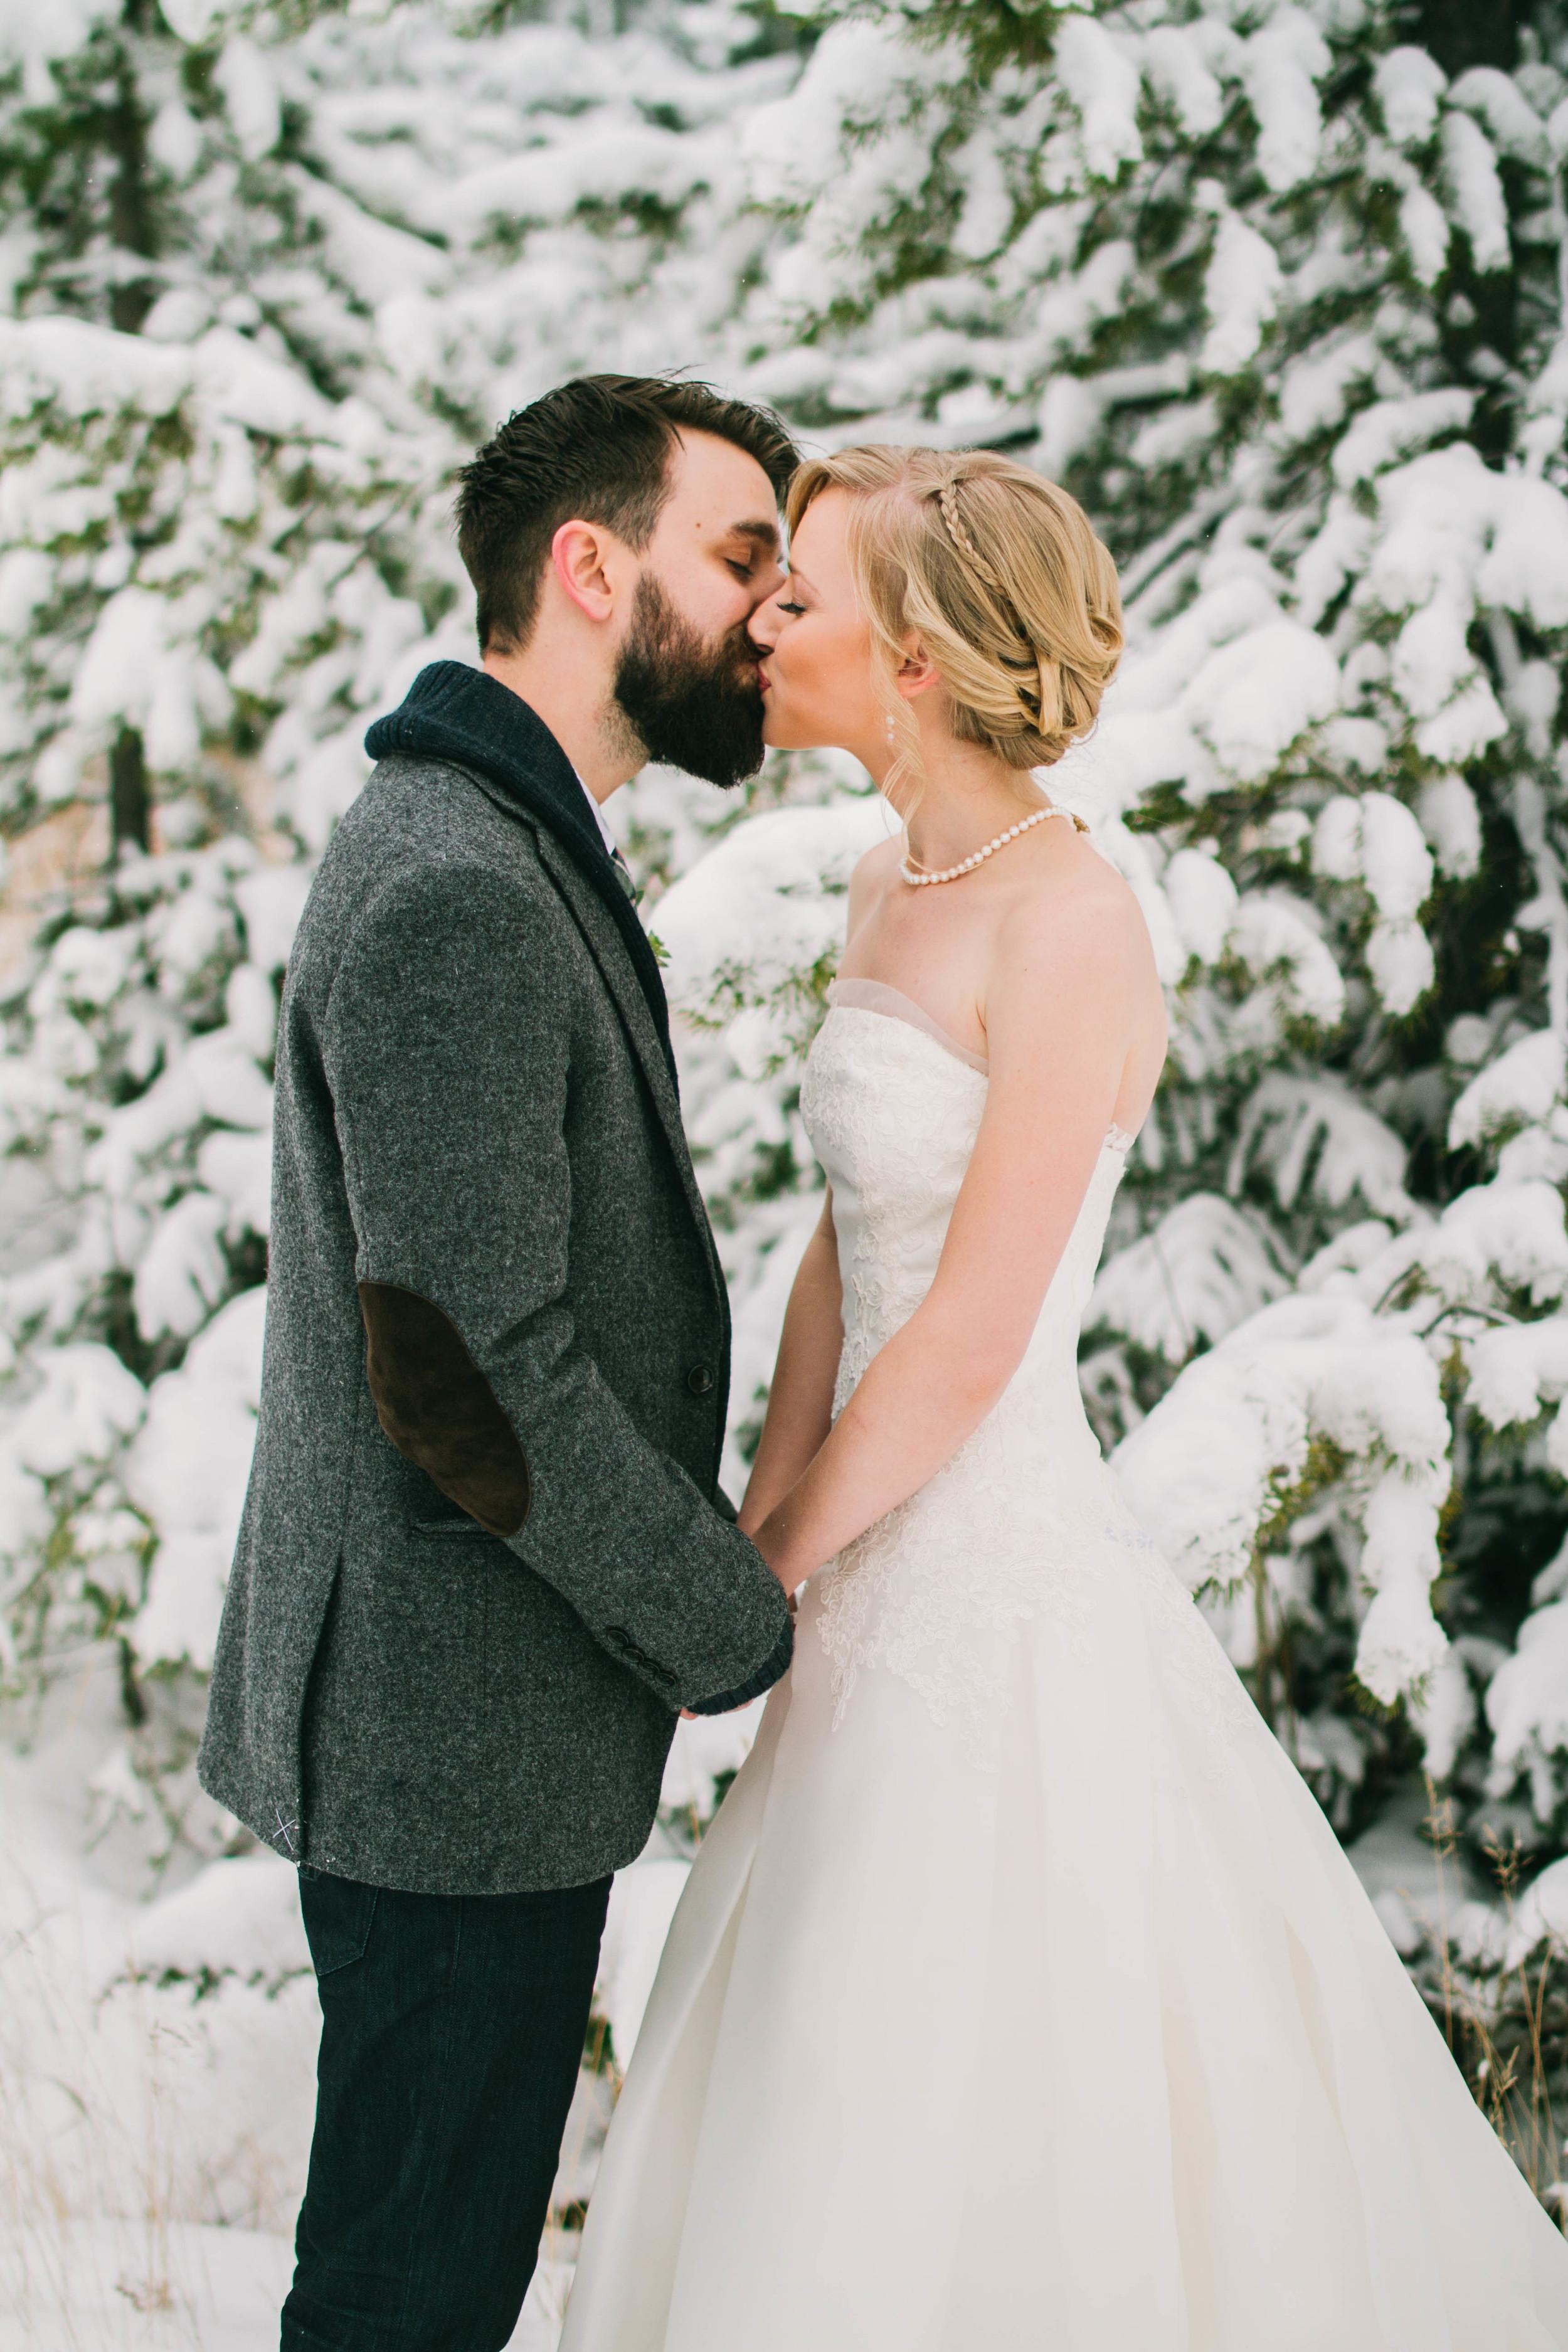 Bonin Wedding - Madeleine Bonin Photography-5813.jpg